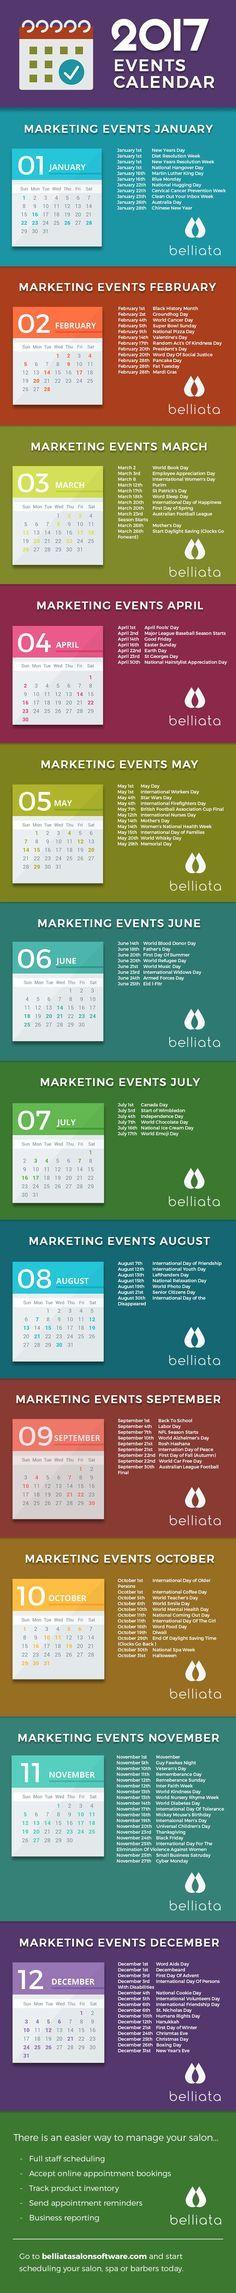 2016-retail-marketing-calendar u2026 Pinteresu2026 - what is a marketing calendar